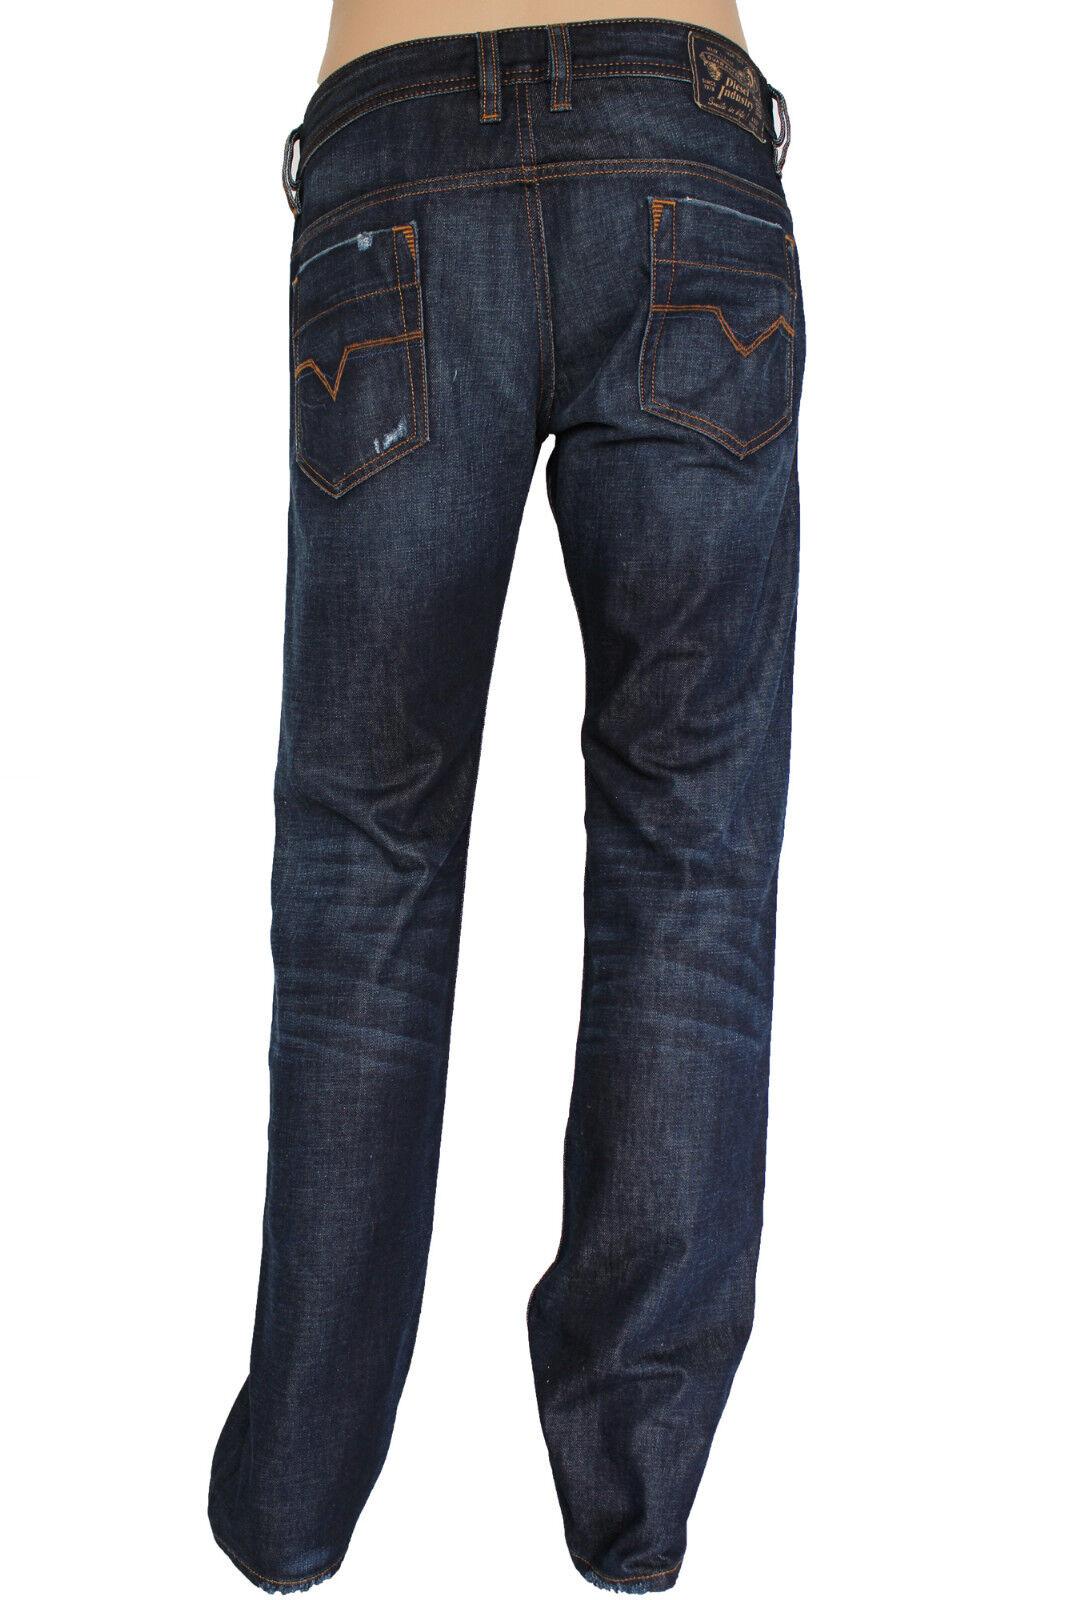 NEW Diesel Mens Size 30w 33L Safado Slim Straight bluee Jeans